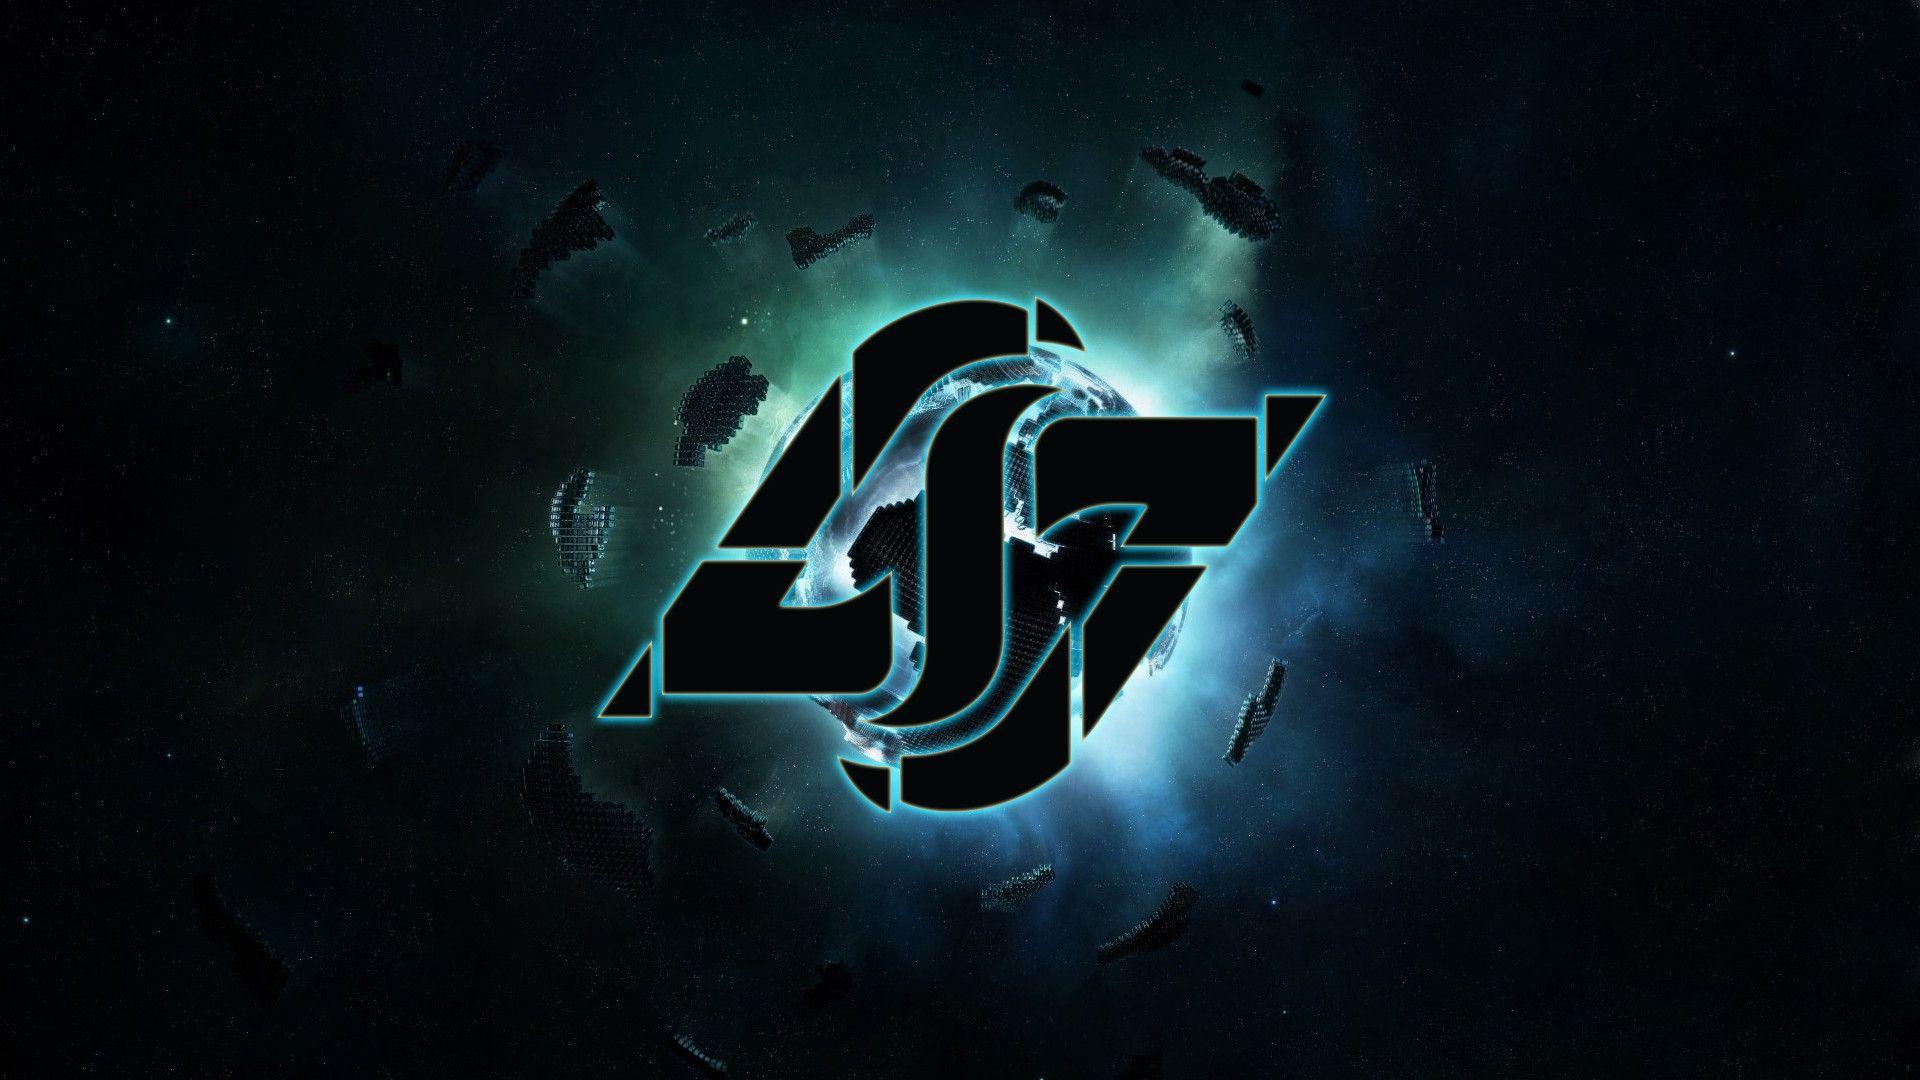 CLG Counter Logic Gaming Black Wallpaper Lol teams